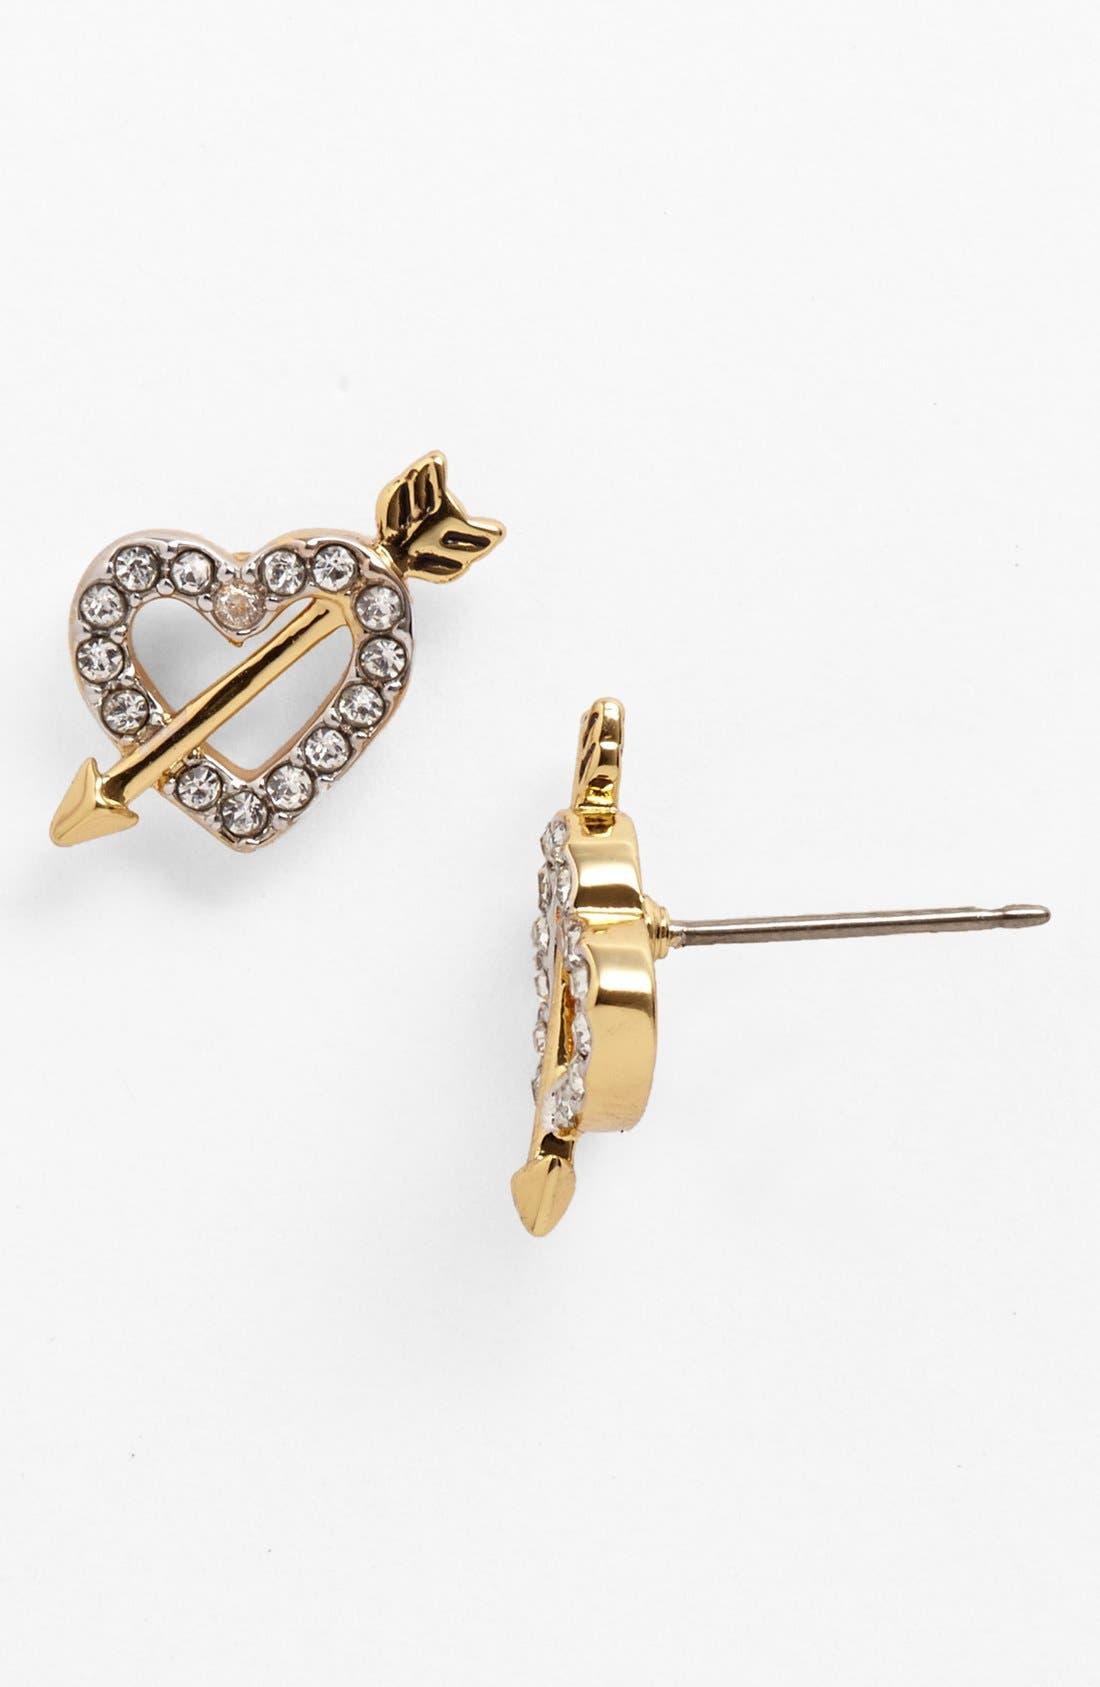 Alternate Image 1 Selected - Juicy Couture 'Juicy at Heart' Heart & Arrow Stud Earrings